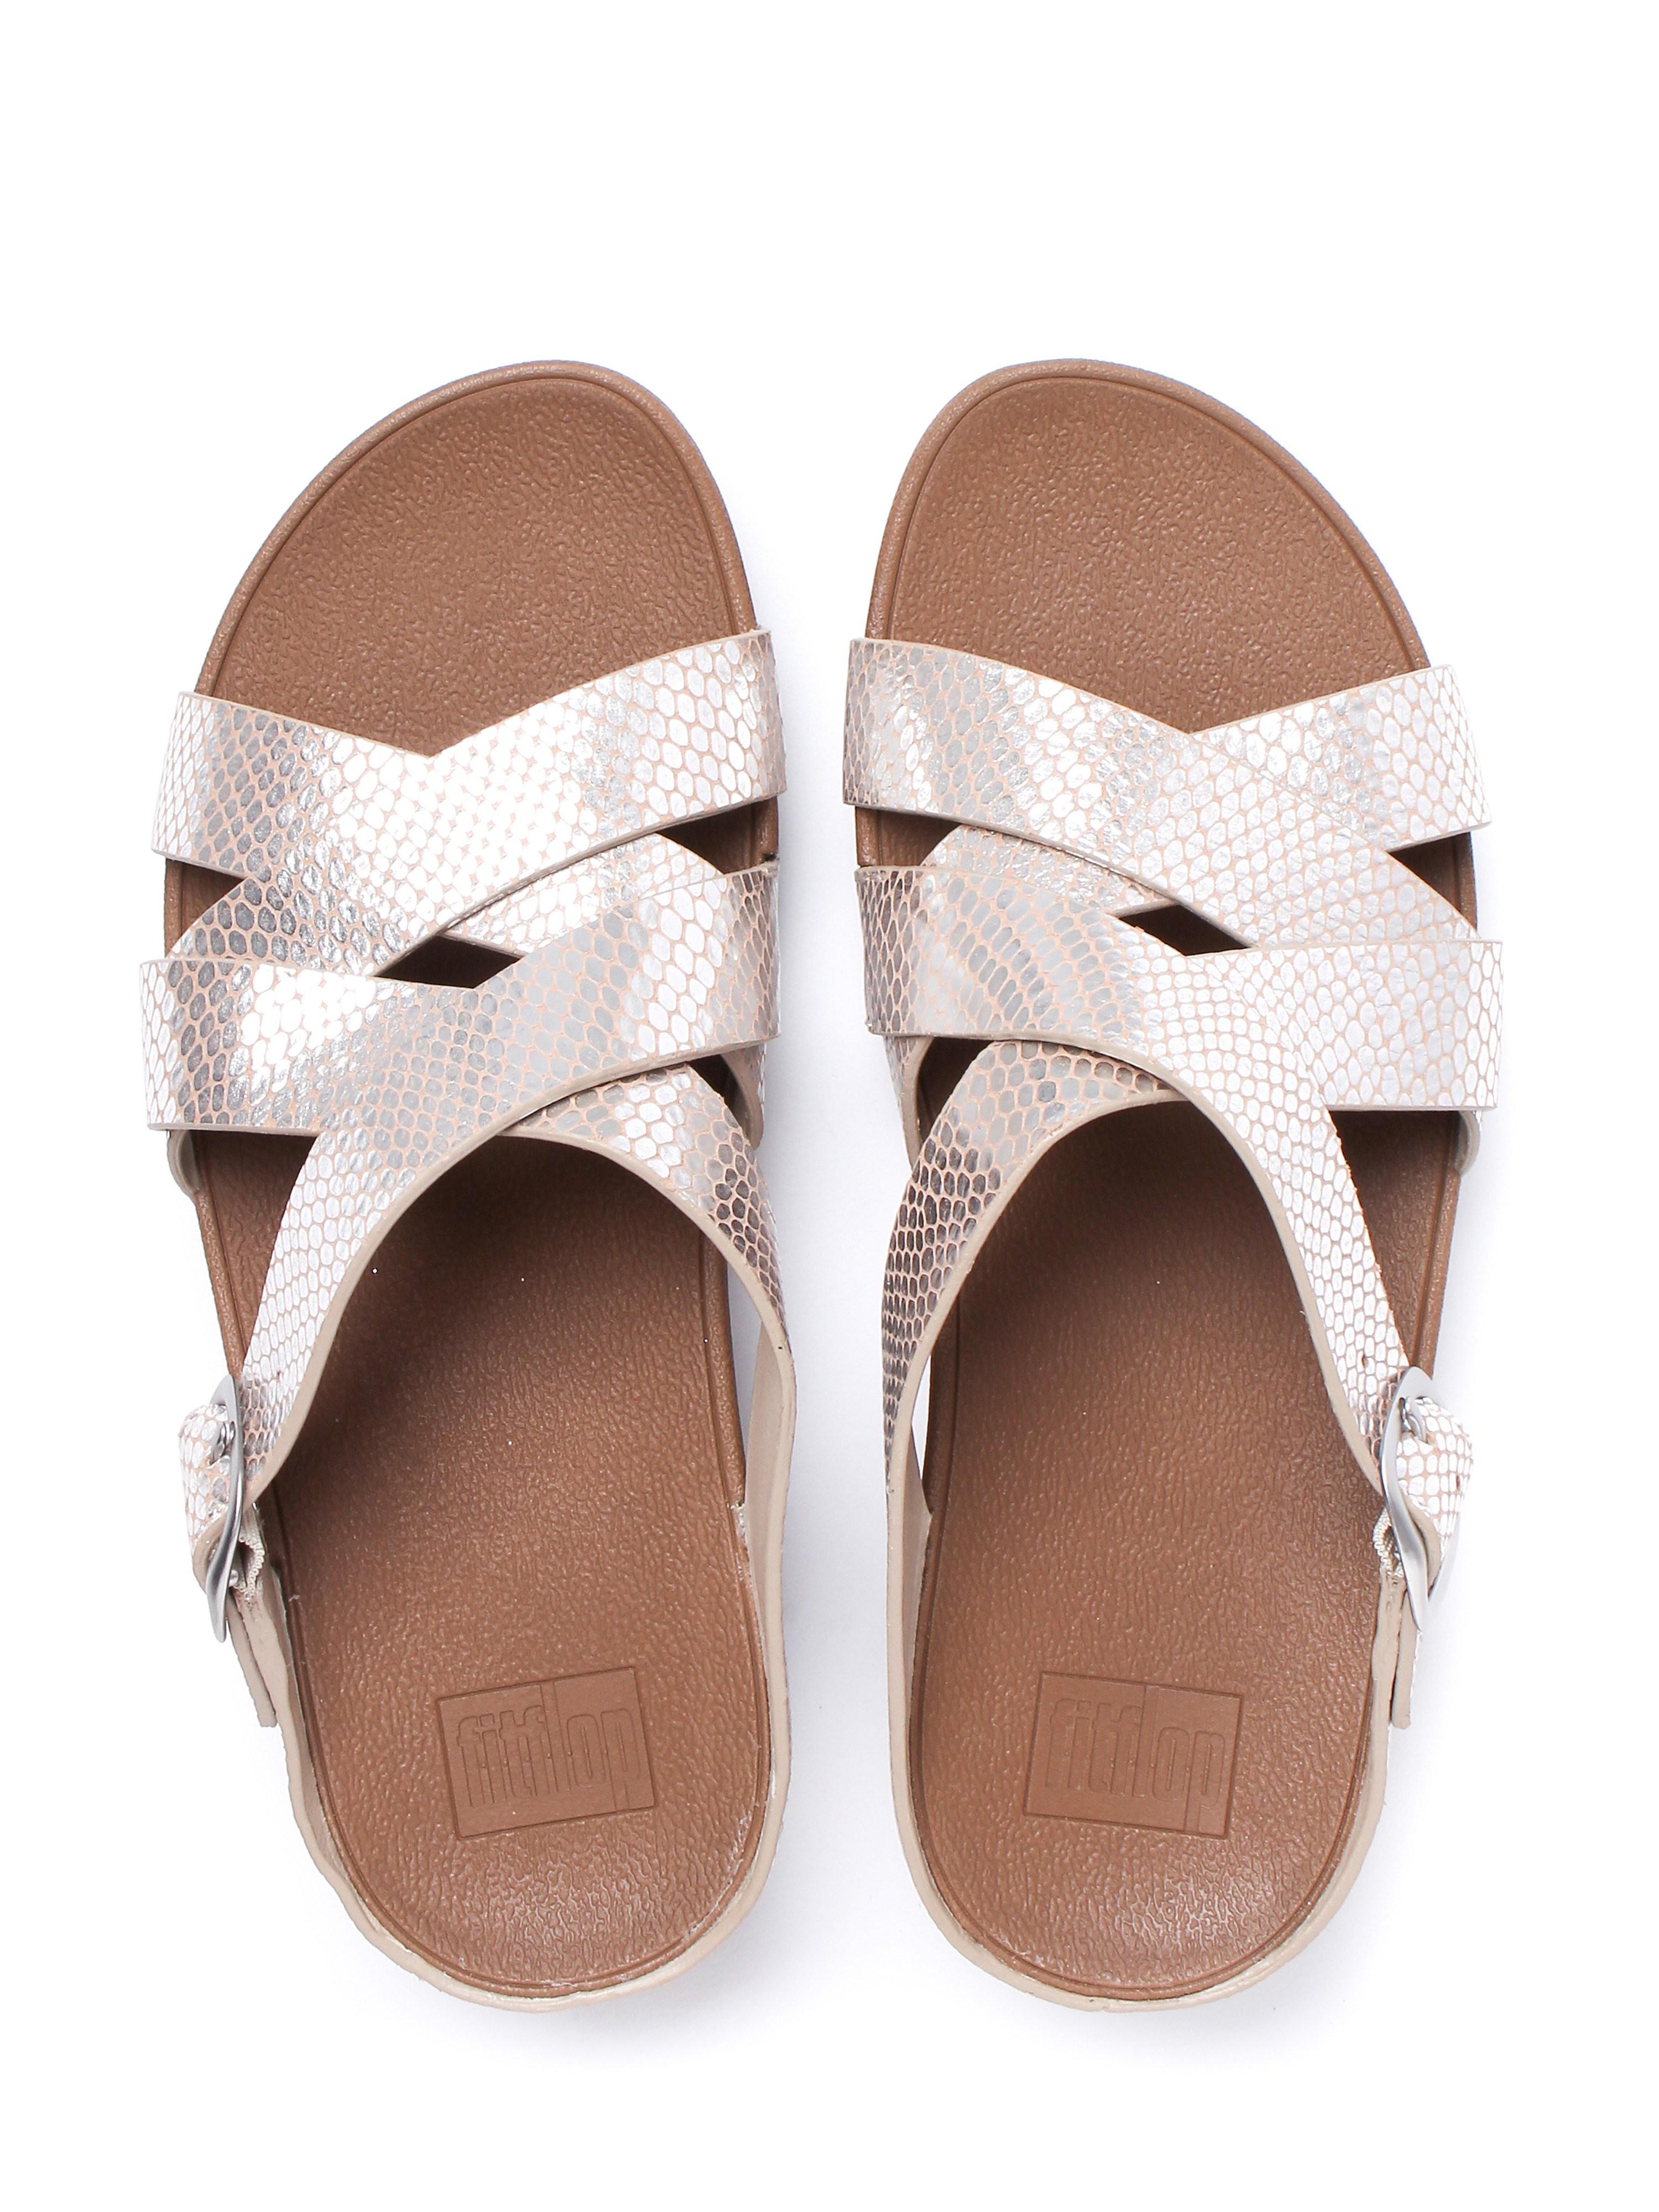 FitFlop Women's Skinny Slide Sandals - Silver Snake